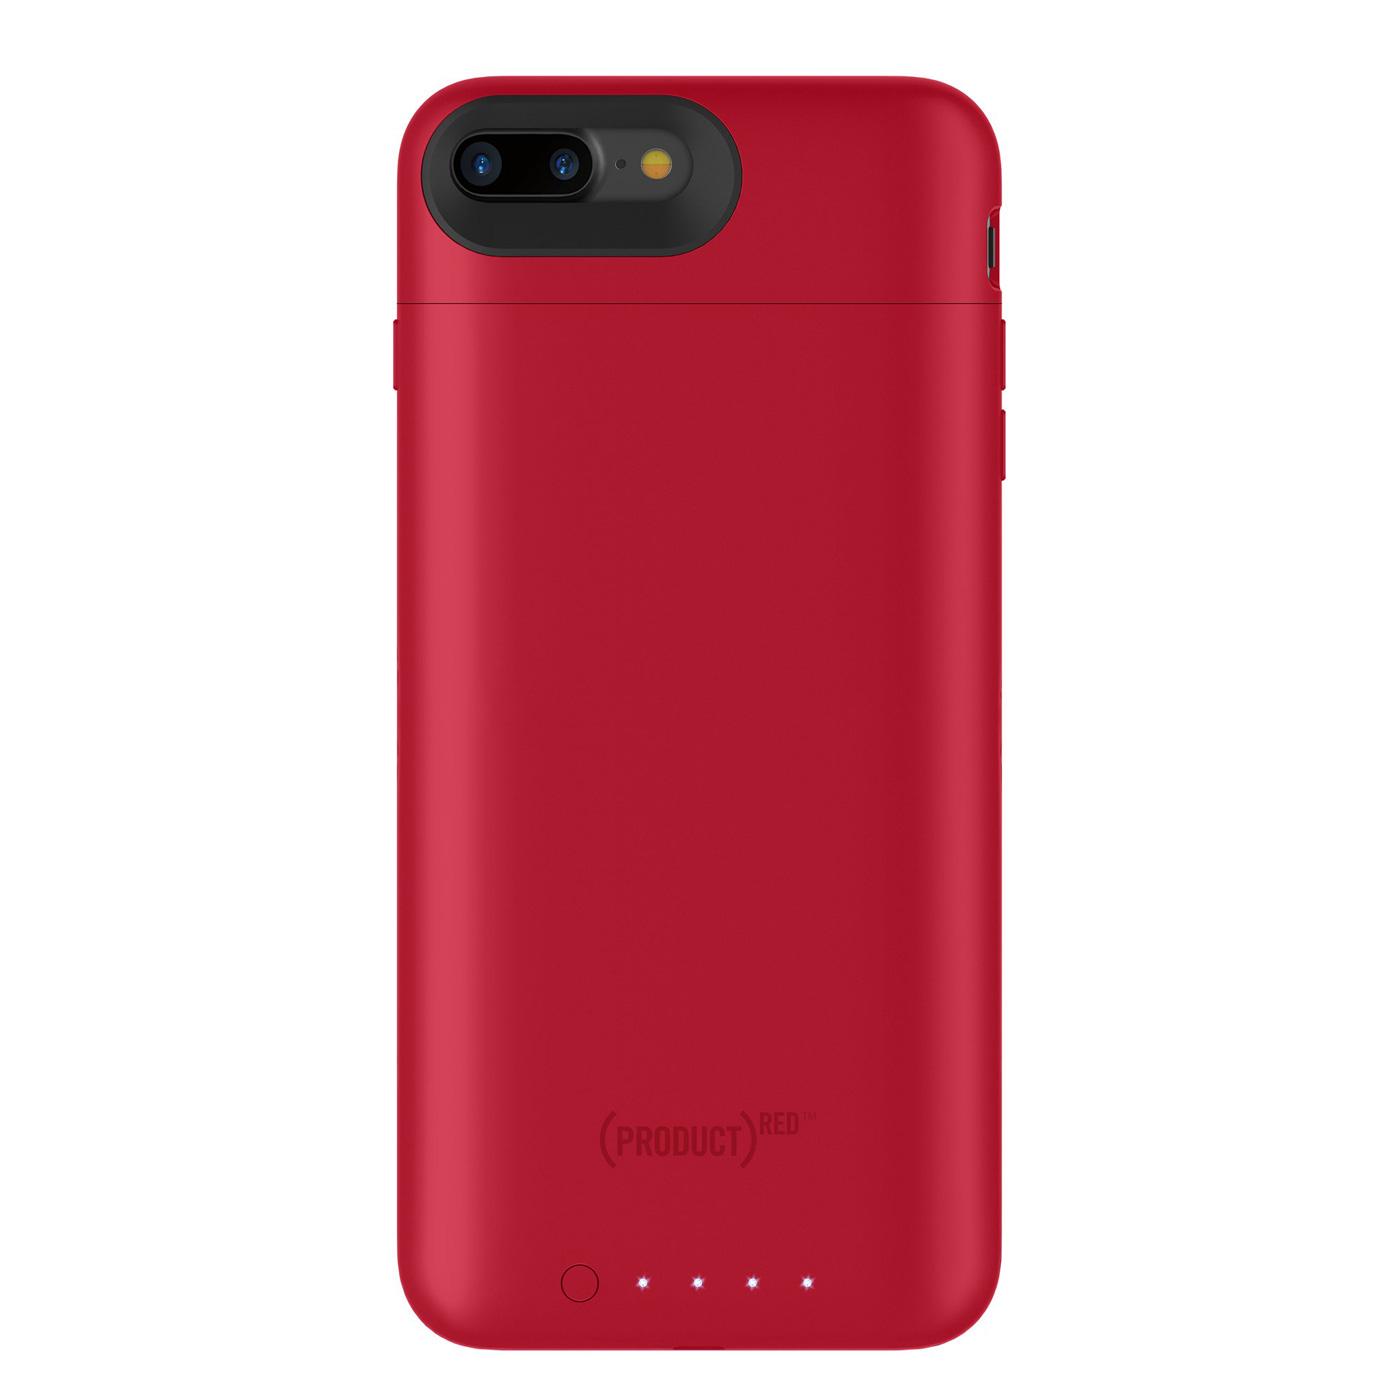 mophie juice pack air rouge iphone 7 plus etui t l phone. Black Bedroom Furniture Sets. Home Design Ideas